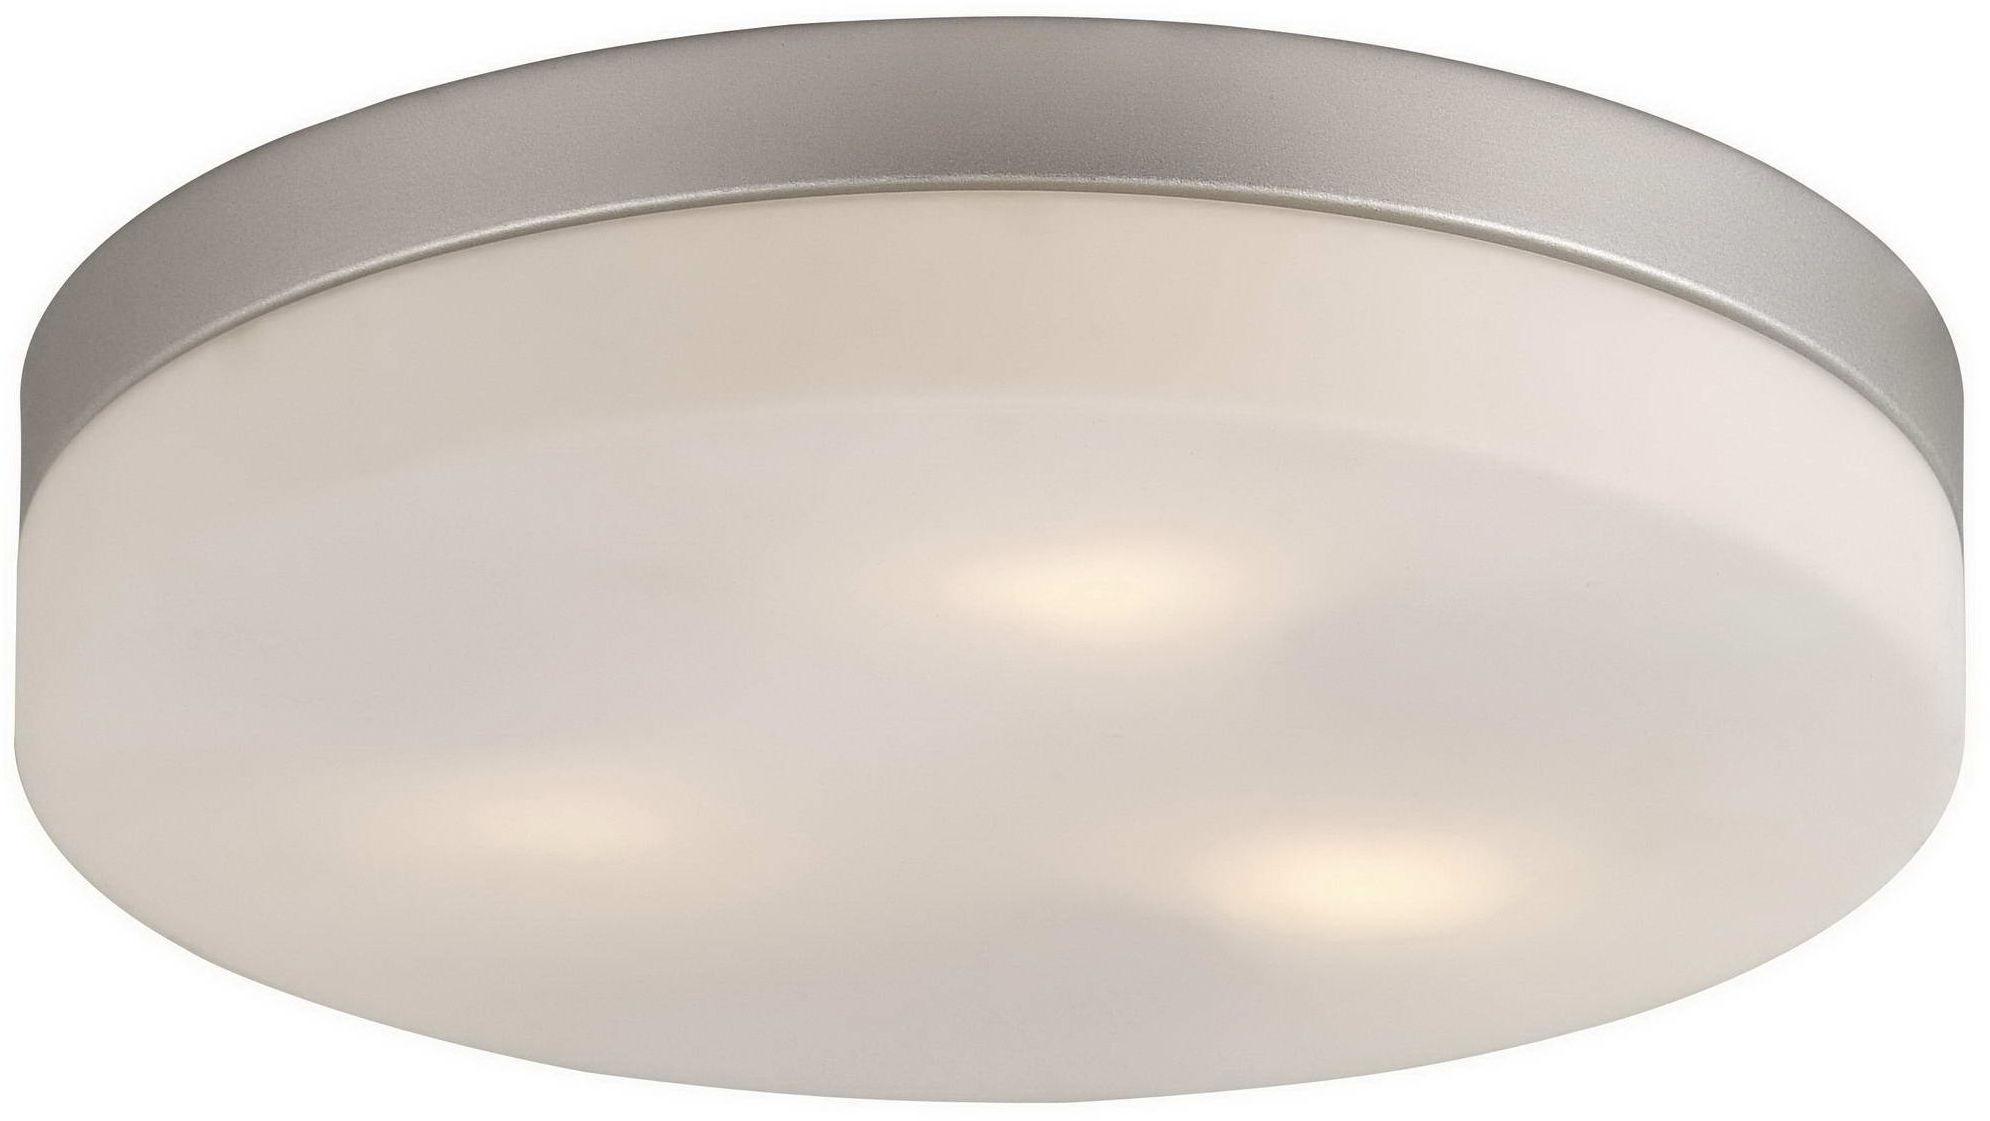 Globo plafon lampa sufitowa Vranos 32113 aluminium srebrny metalik, szkło opalizowane, IP44 30cm